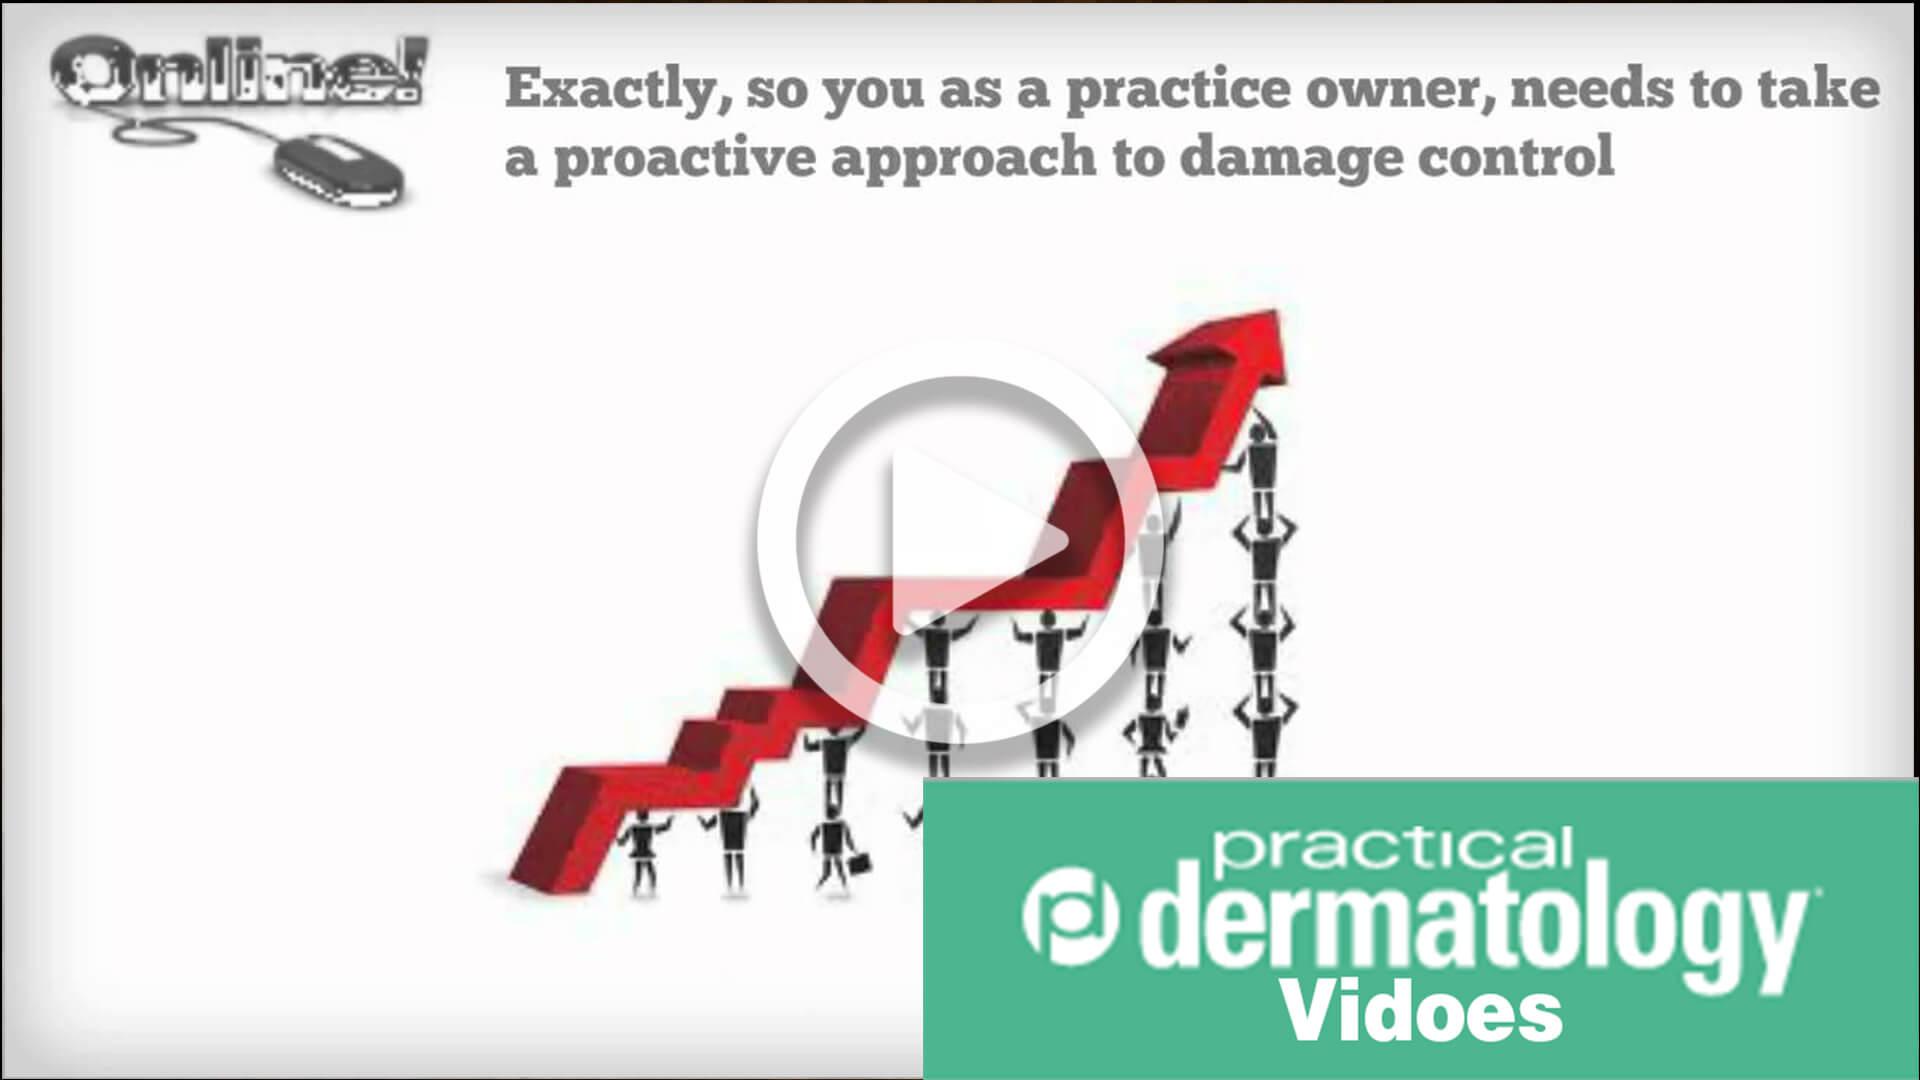 Managing your Practice's online reputation